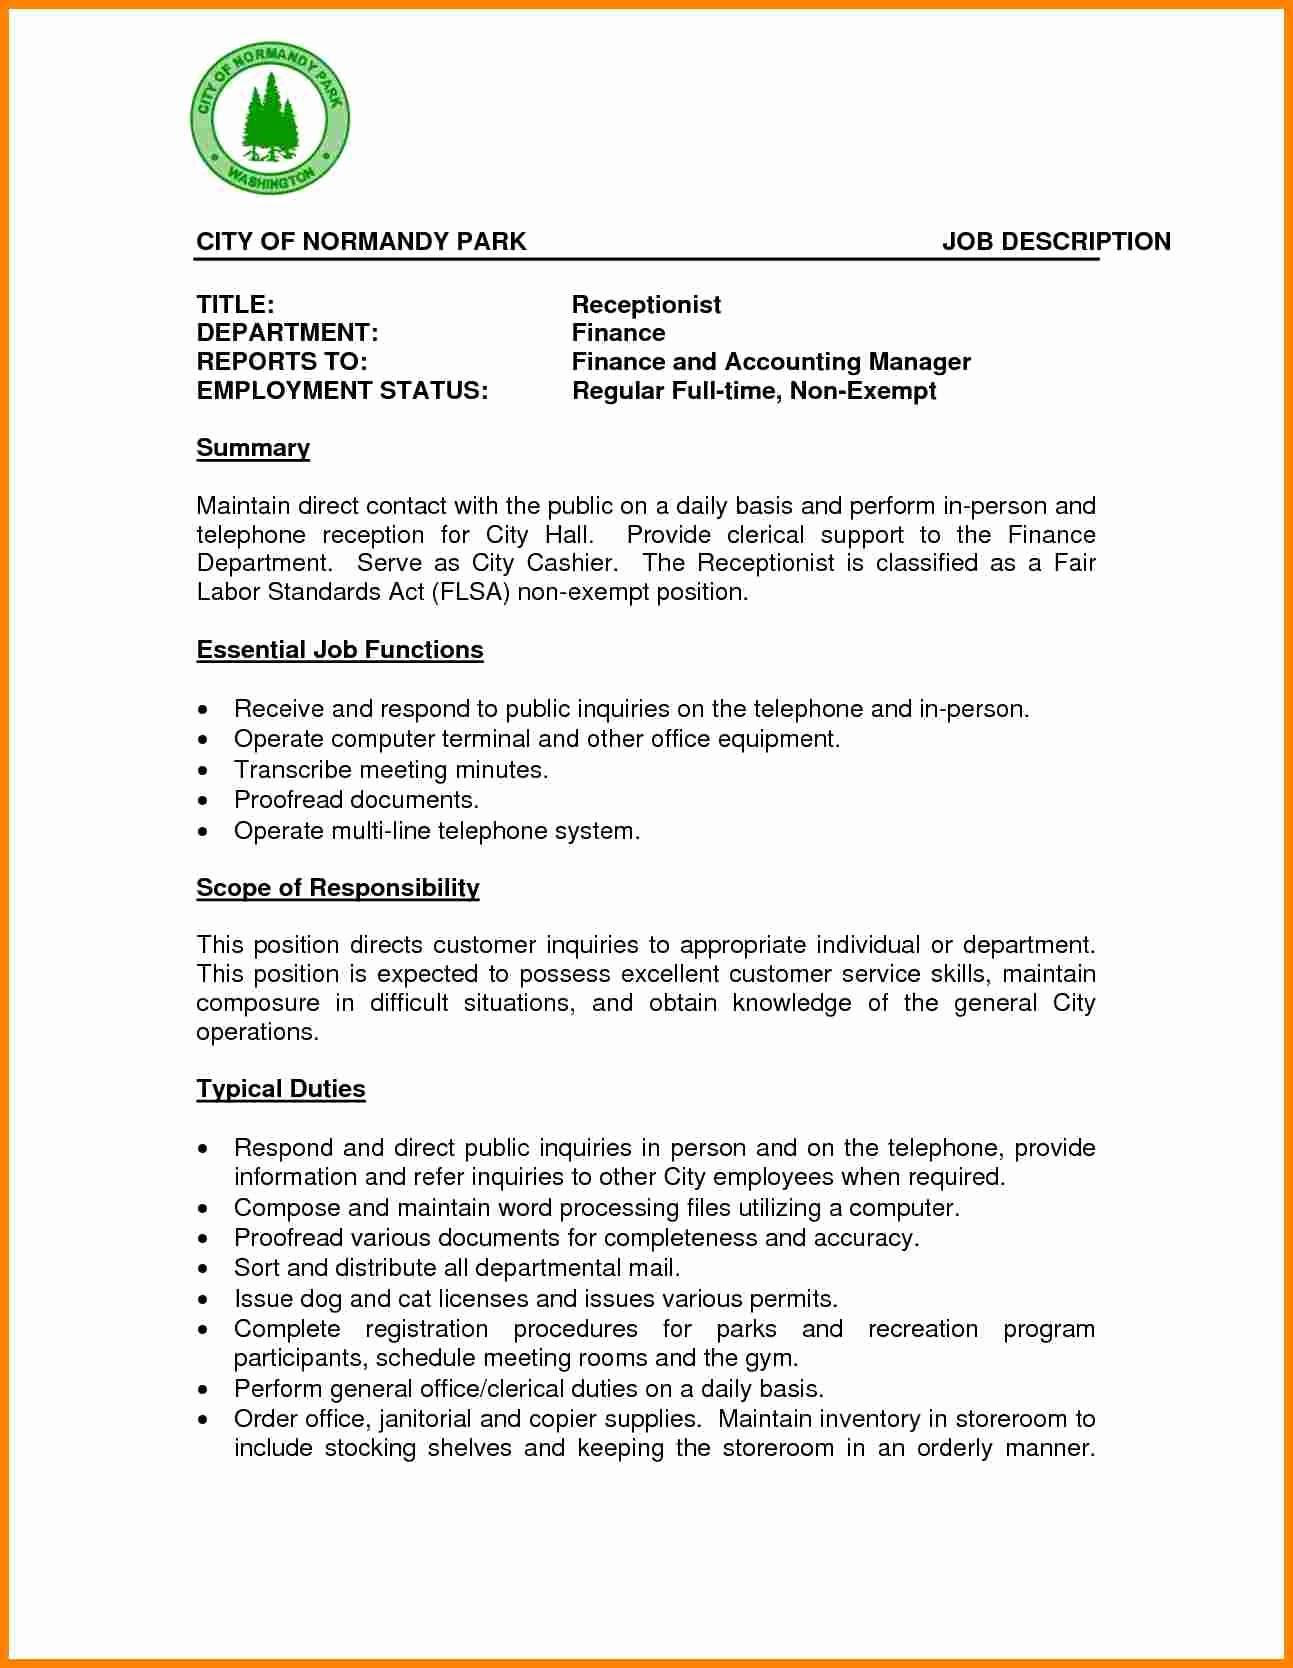 Resume Template for Office Job New 8 Medical Receptionist Job Description